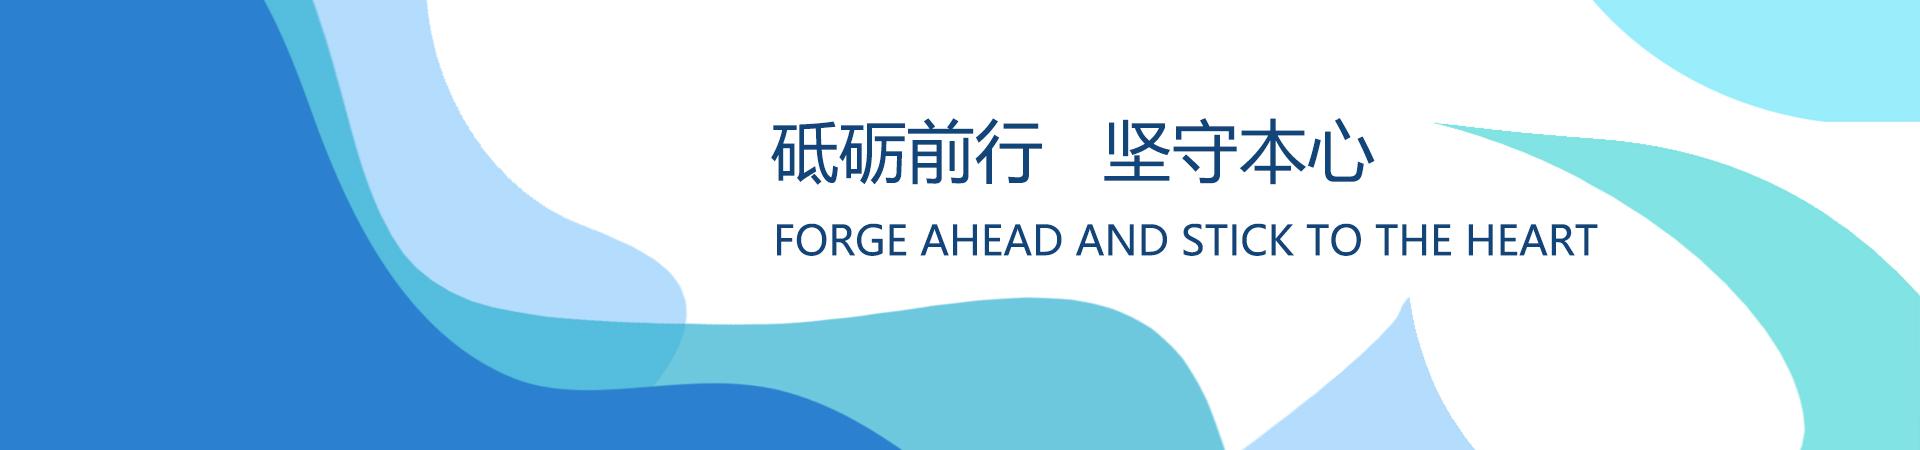 http://www.sealstar.cn/data/upload/202009/20200902155209_731.jpg